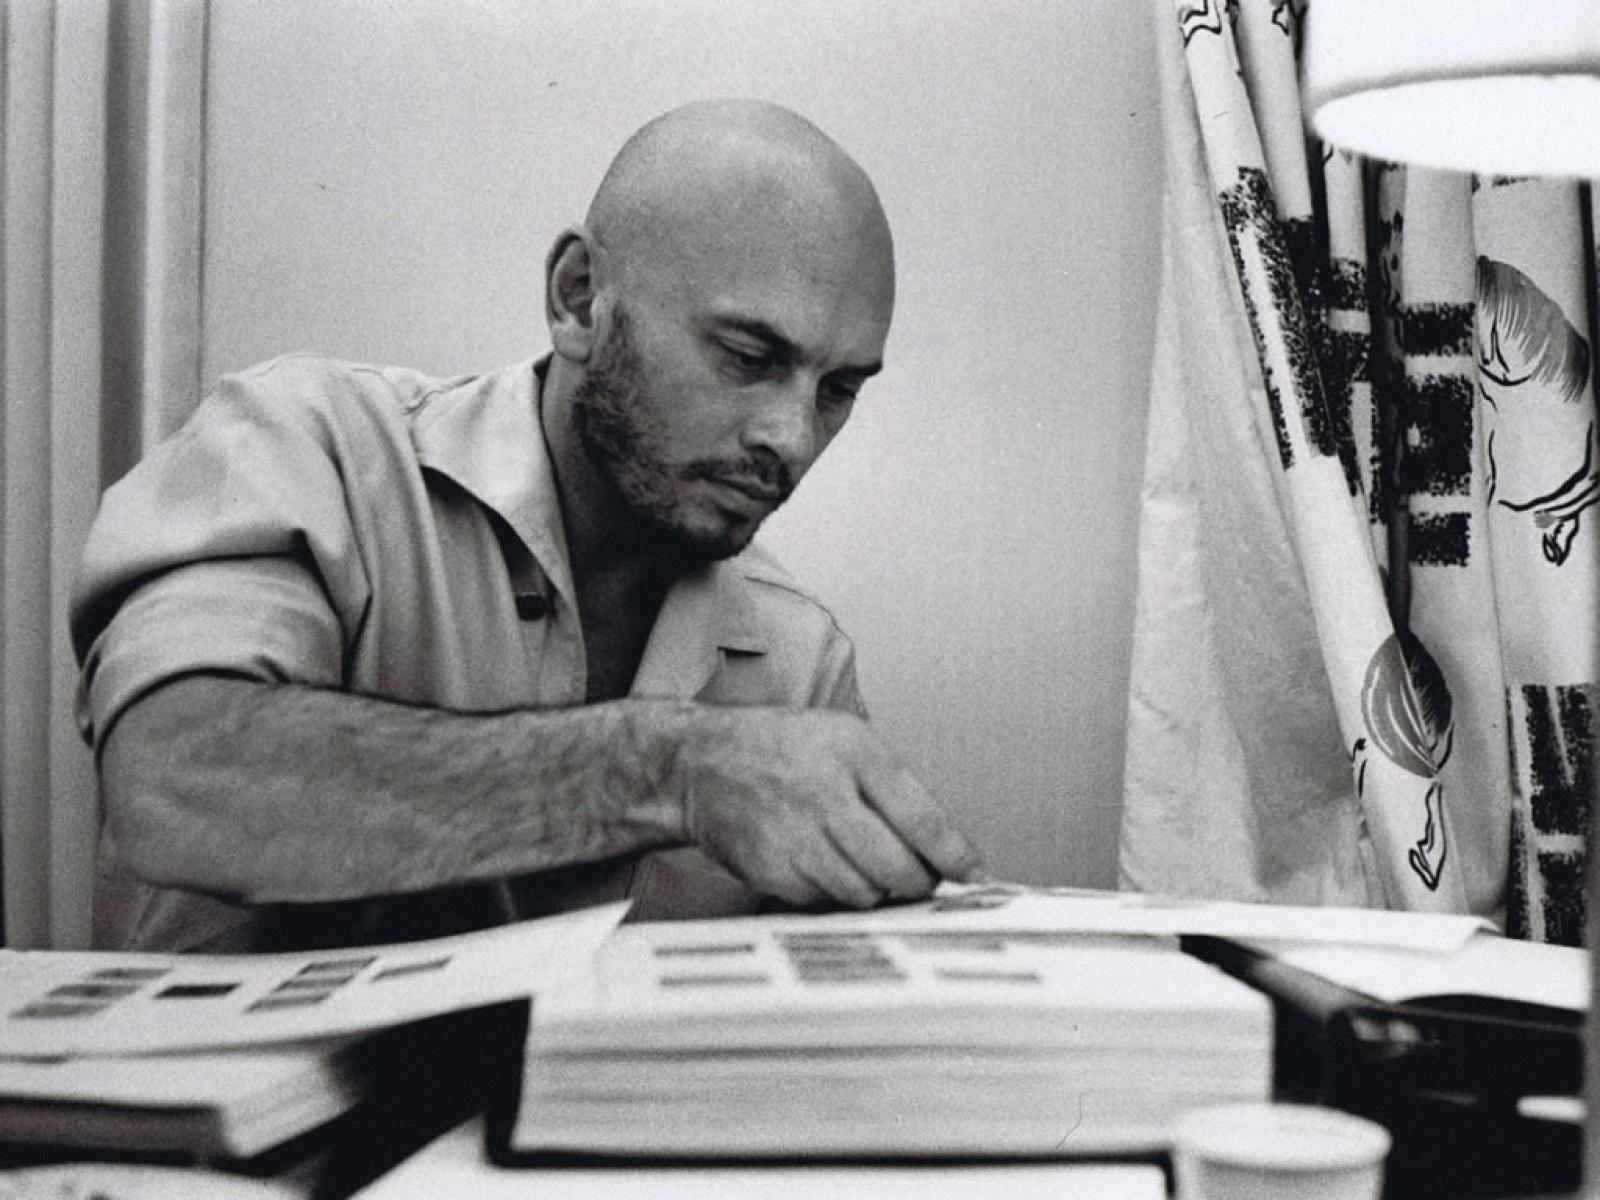 I ve never been big on bald men but Yul Brynner definitely knew how